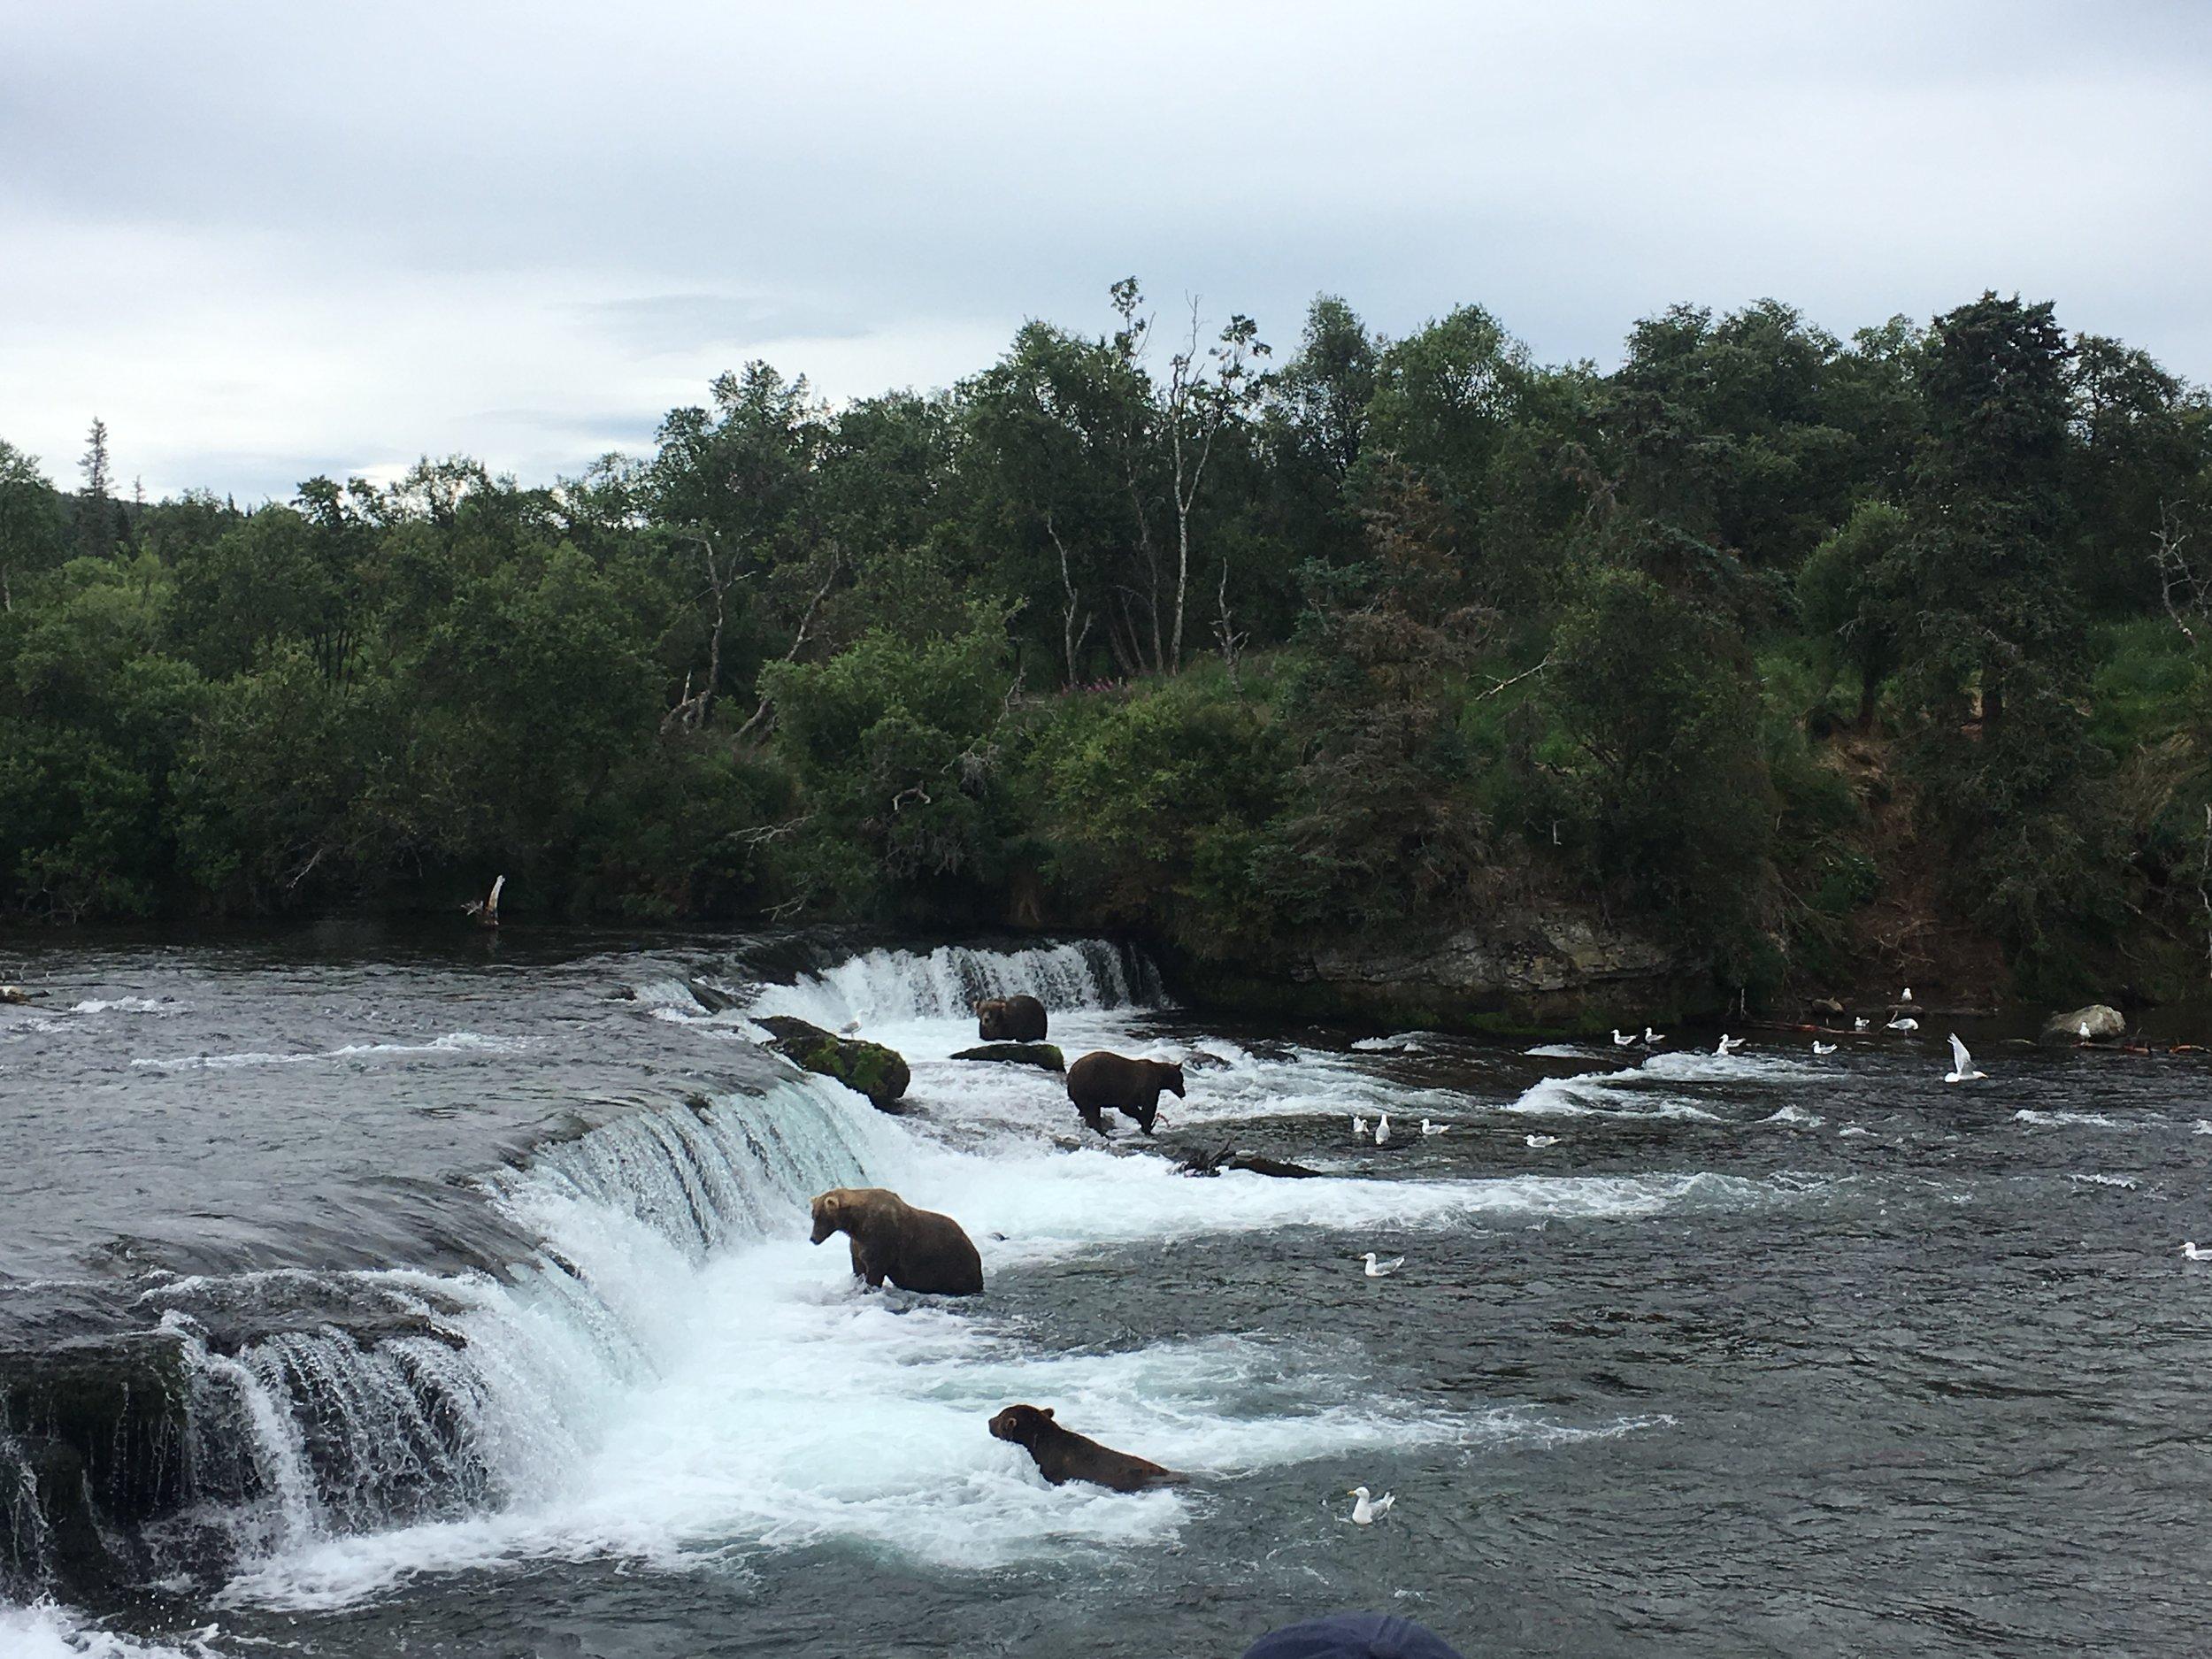 Katmai National Park Bear Watching - The Kissters